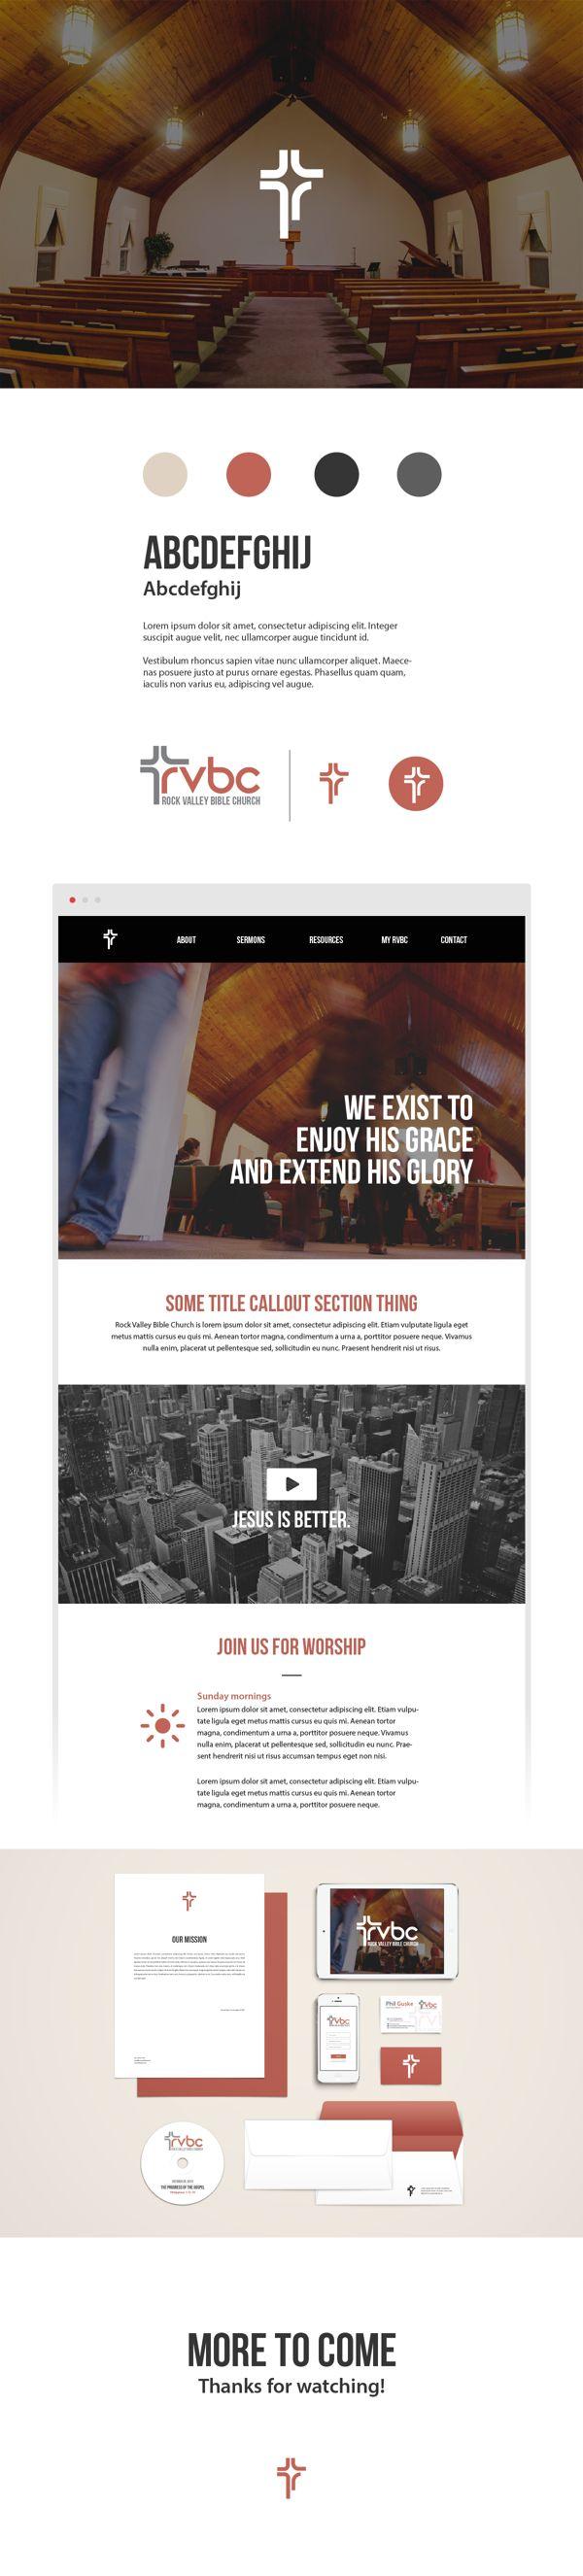 Best 25 Church logo ideas on Pinterest Church graphic design